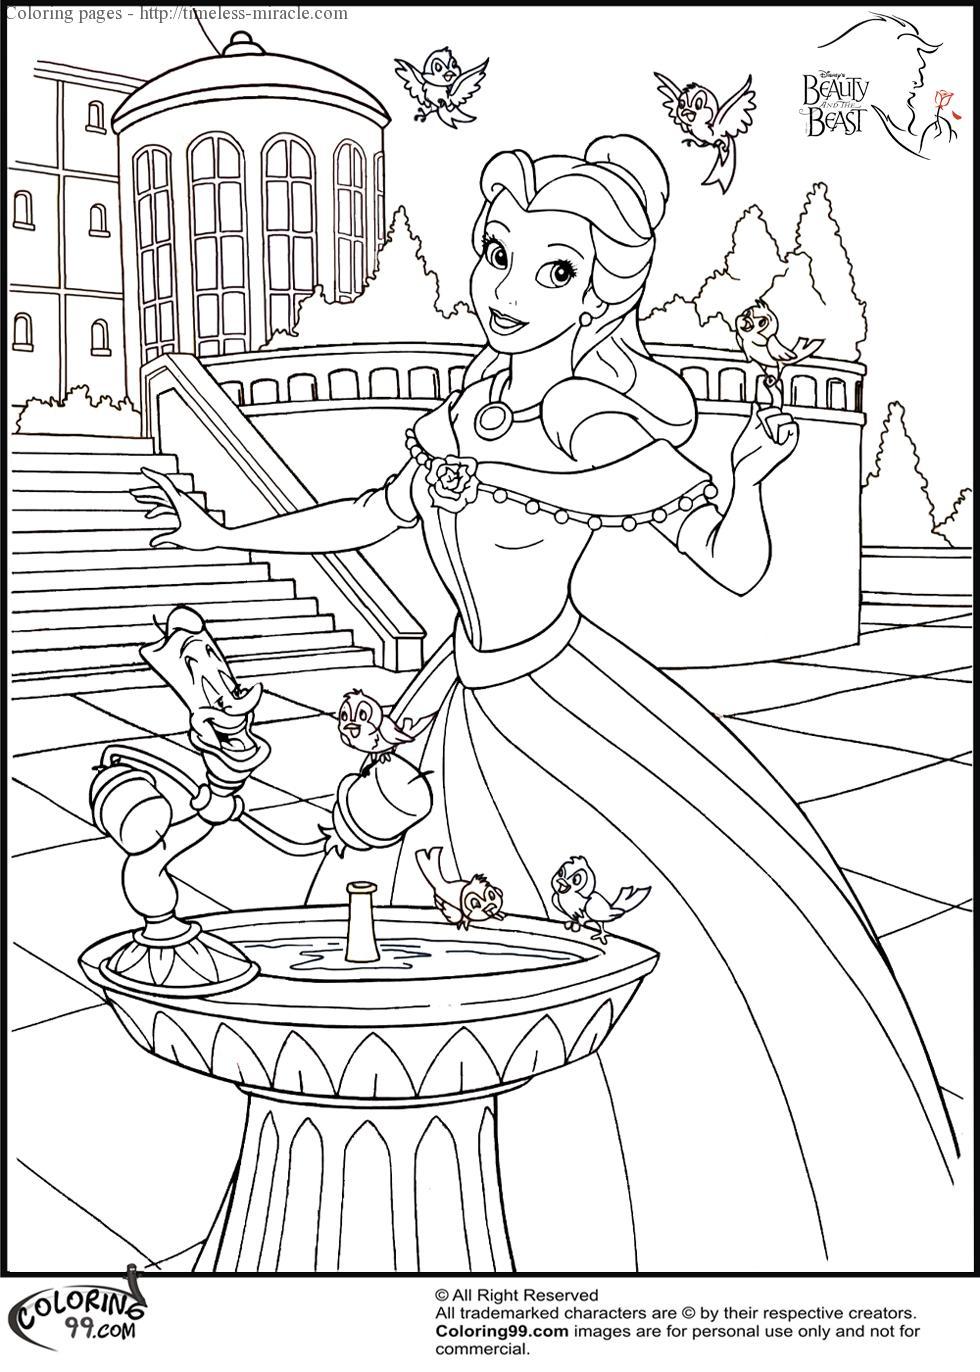 Disney Princess Belle Coloring Pages for preschool #5231 Belle ... | 1372x980